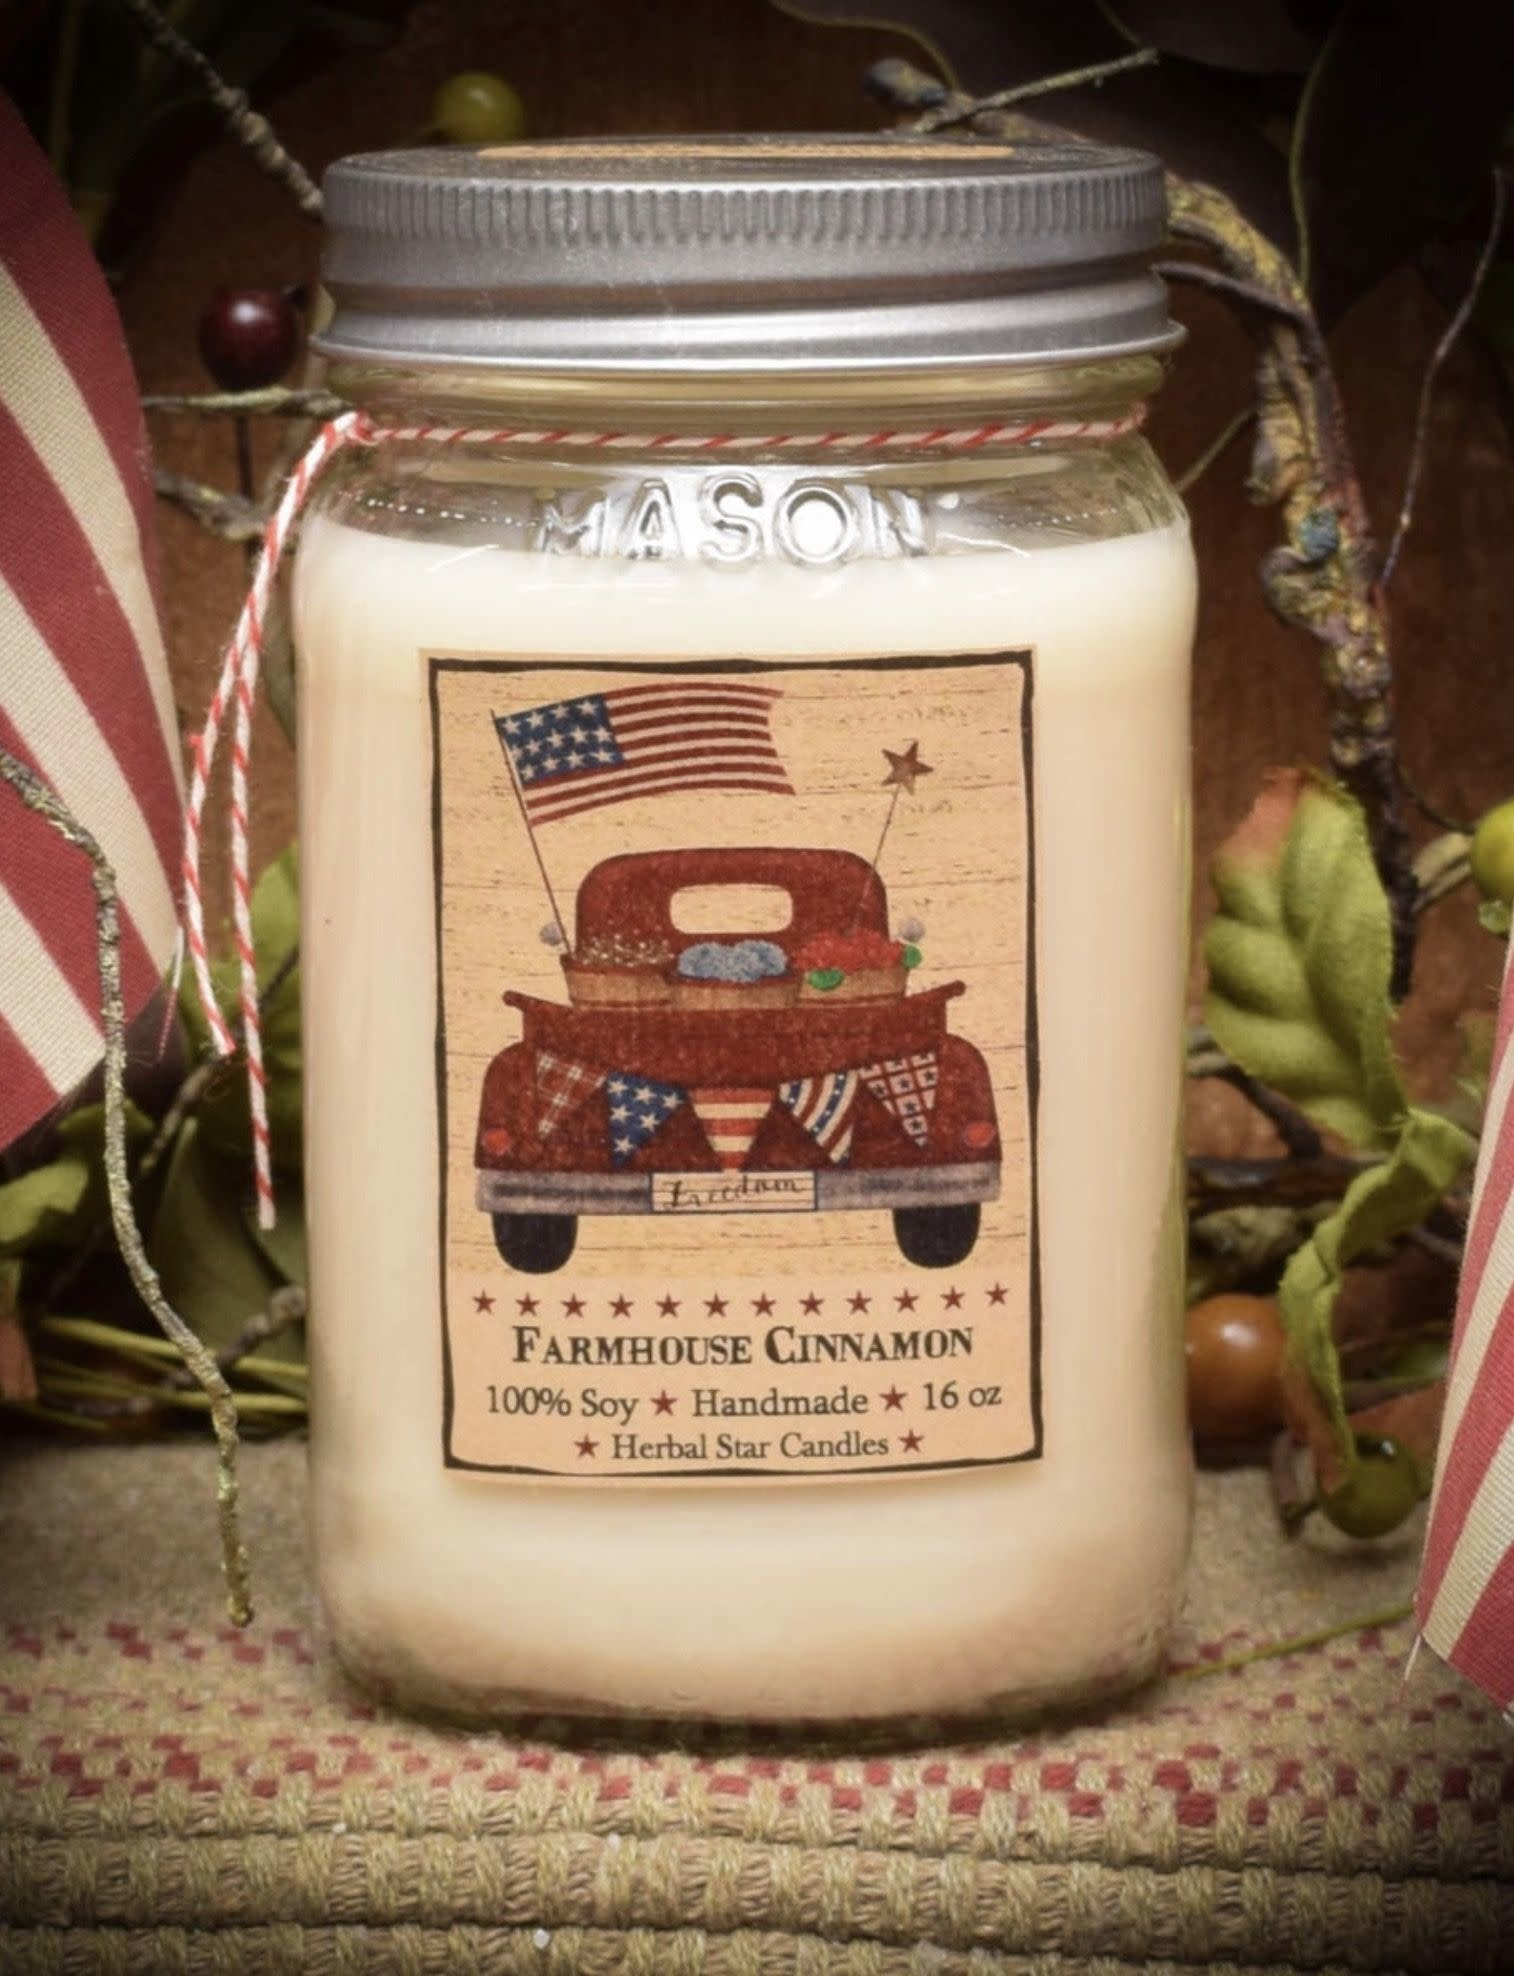 Herbal Star Candles Farmhouse Cinnamon Soy Jar Candle 16oz